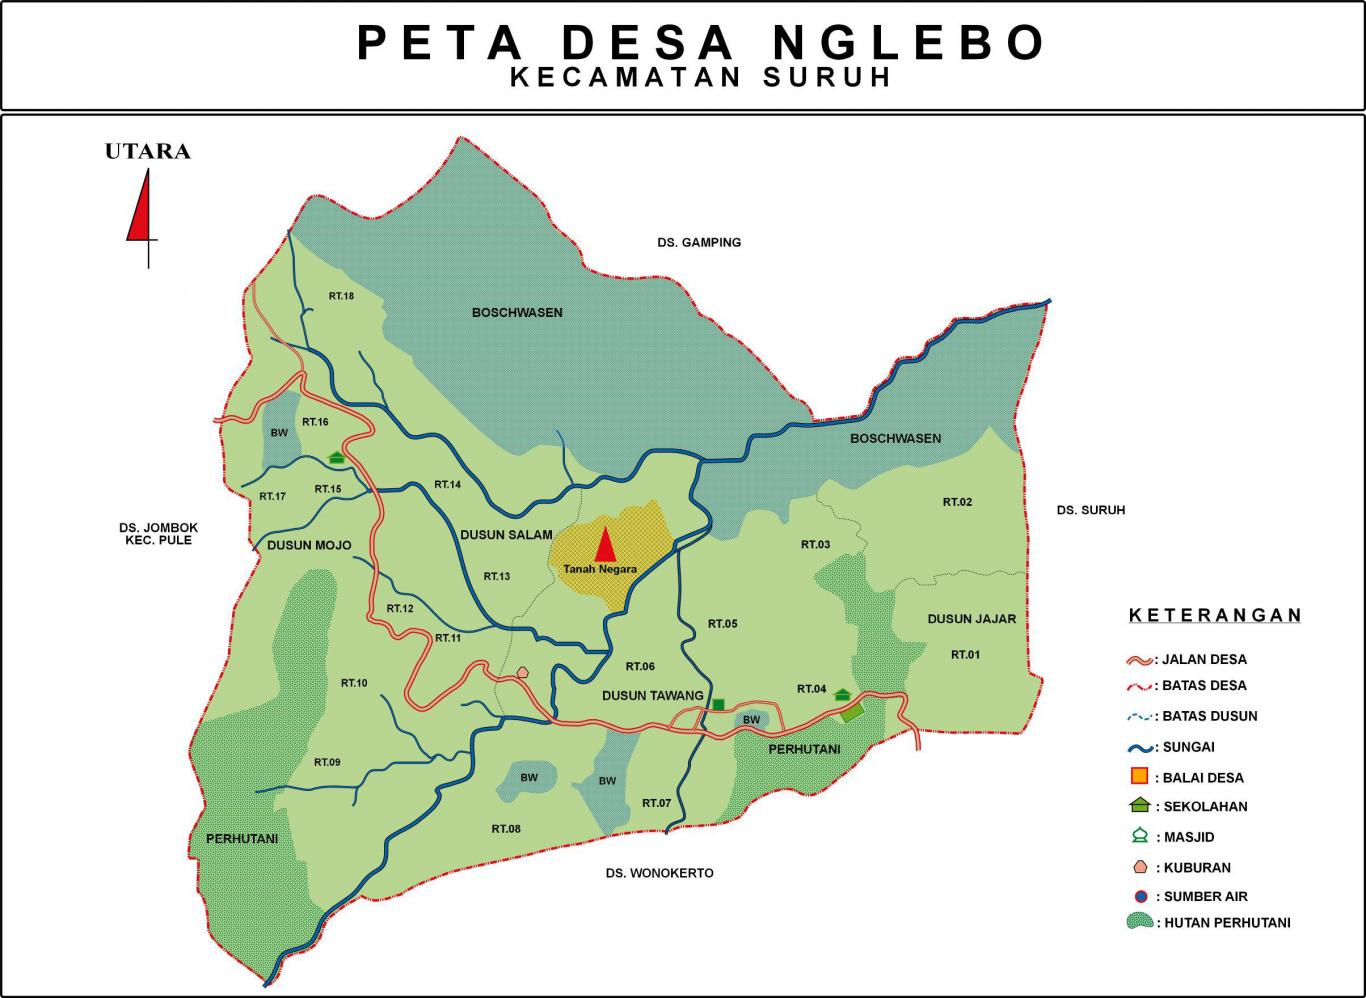 Kondisi Umum Desa - Website Desa Nglebo